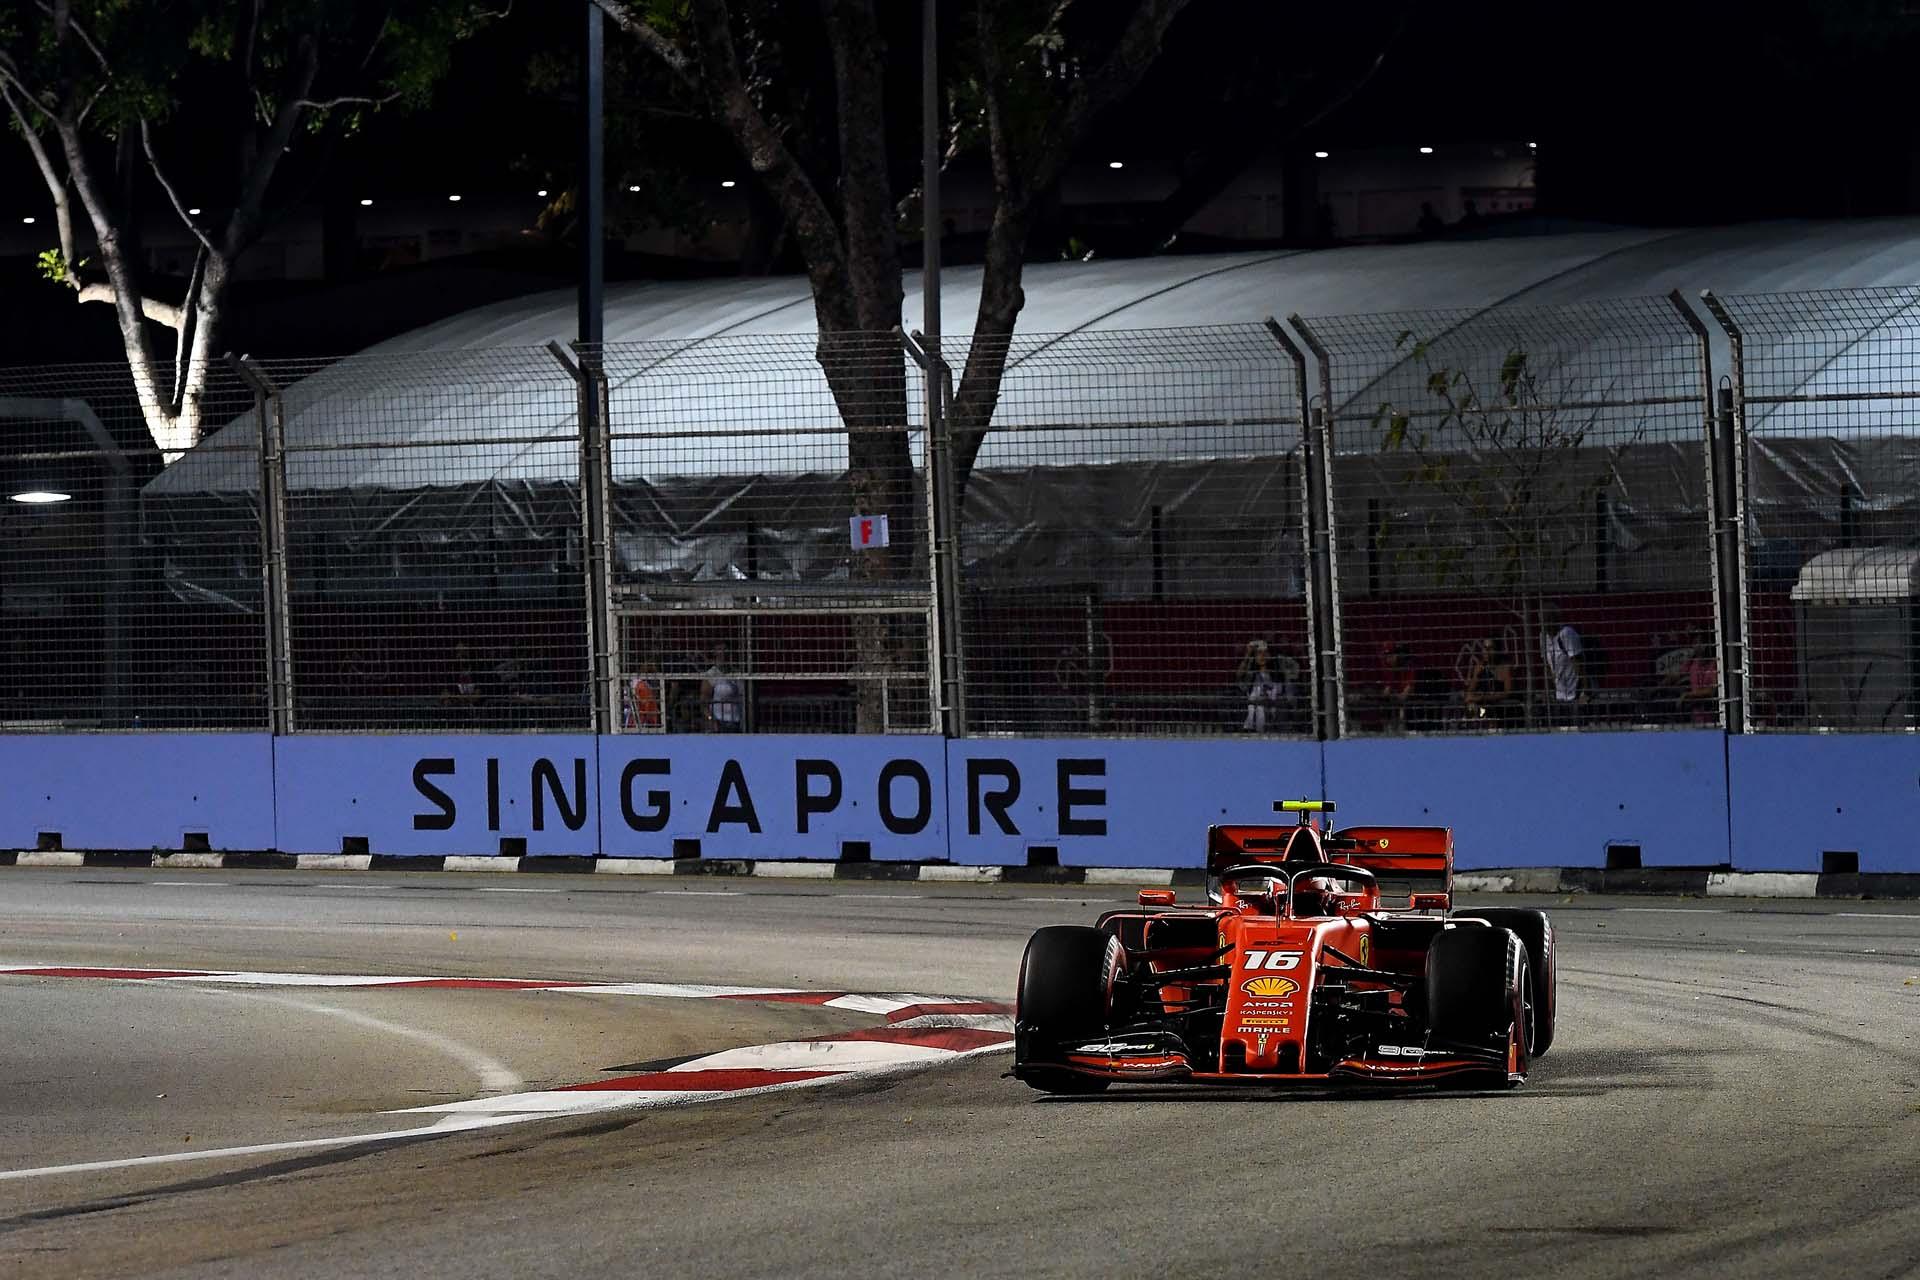 GP SINGAPORE F1/2019 -  VENERDI 20/09/2019